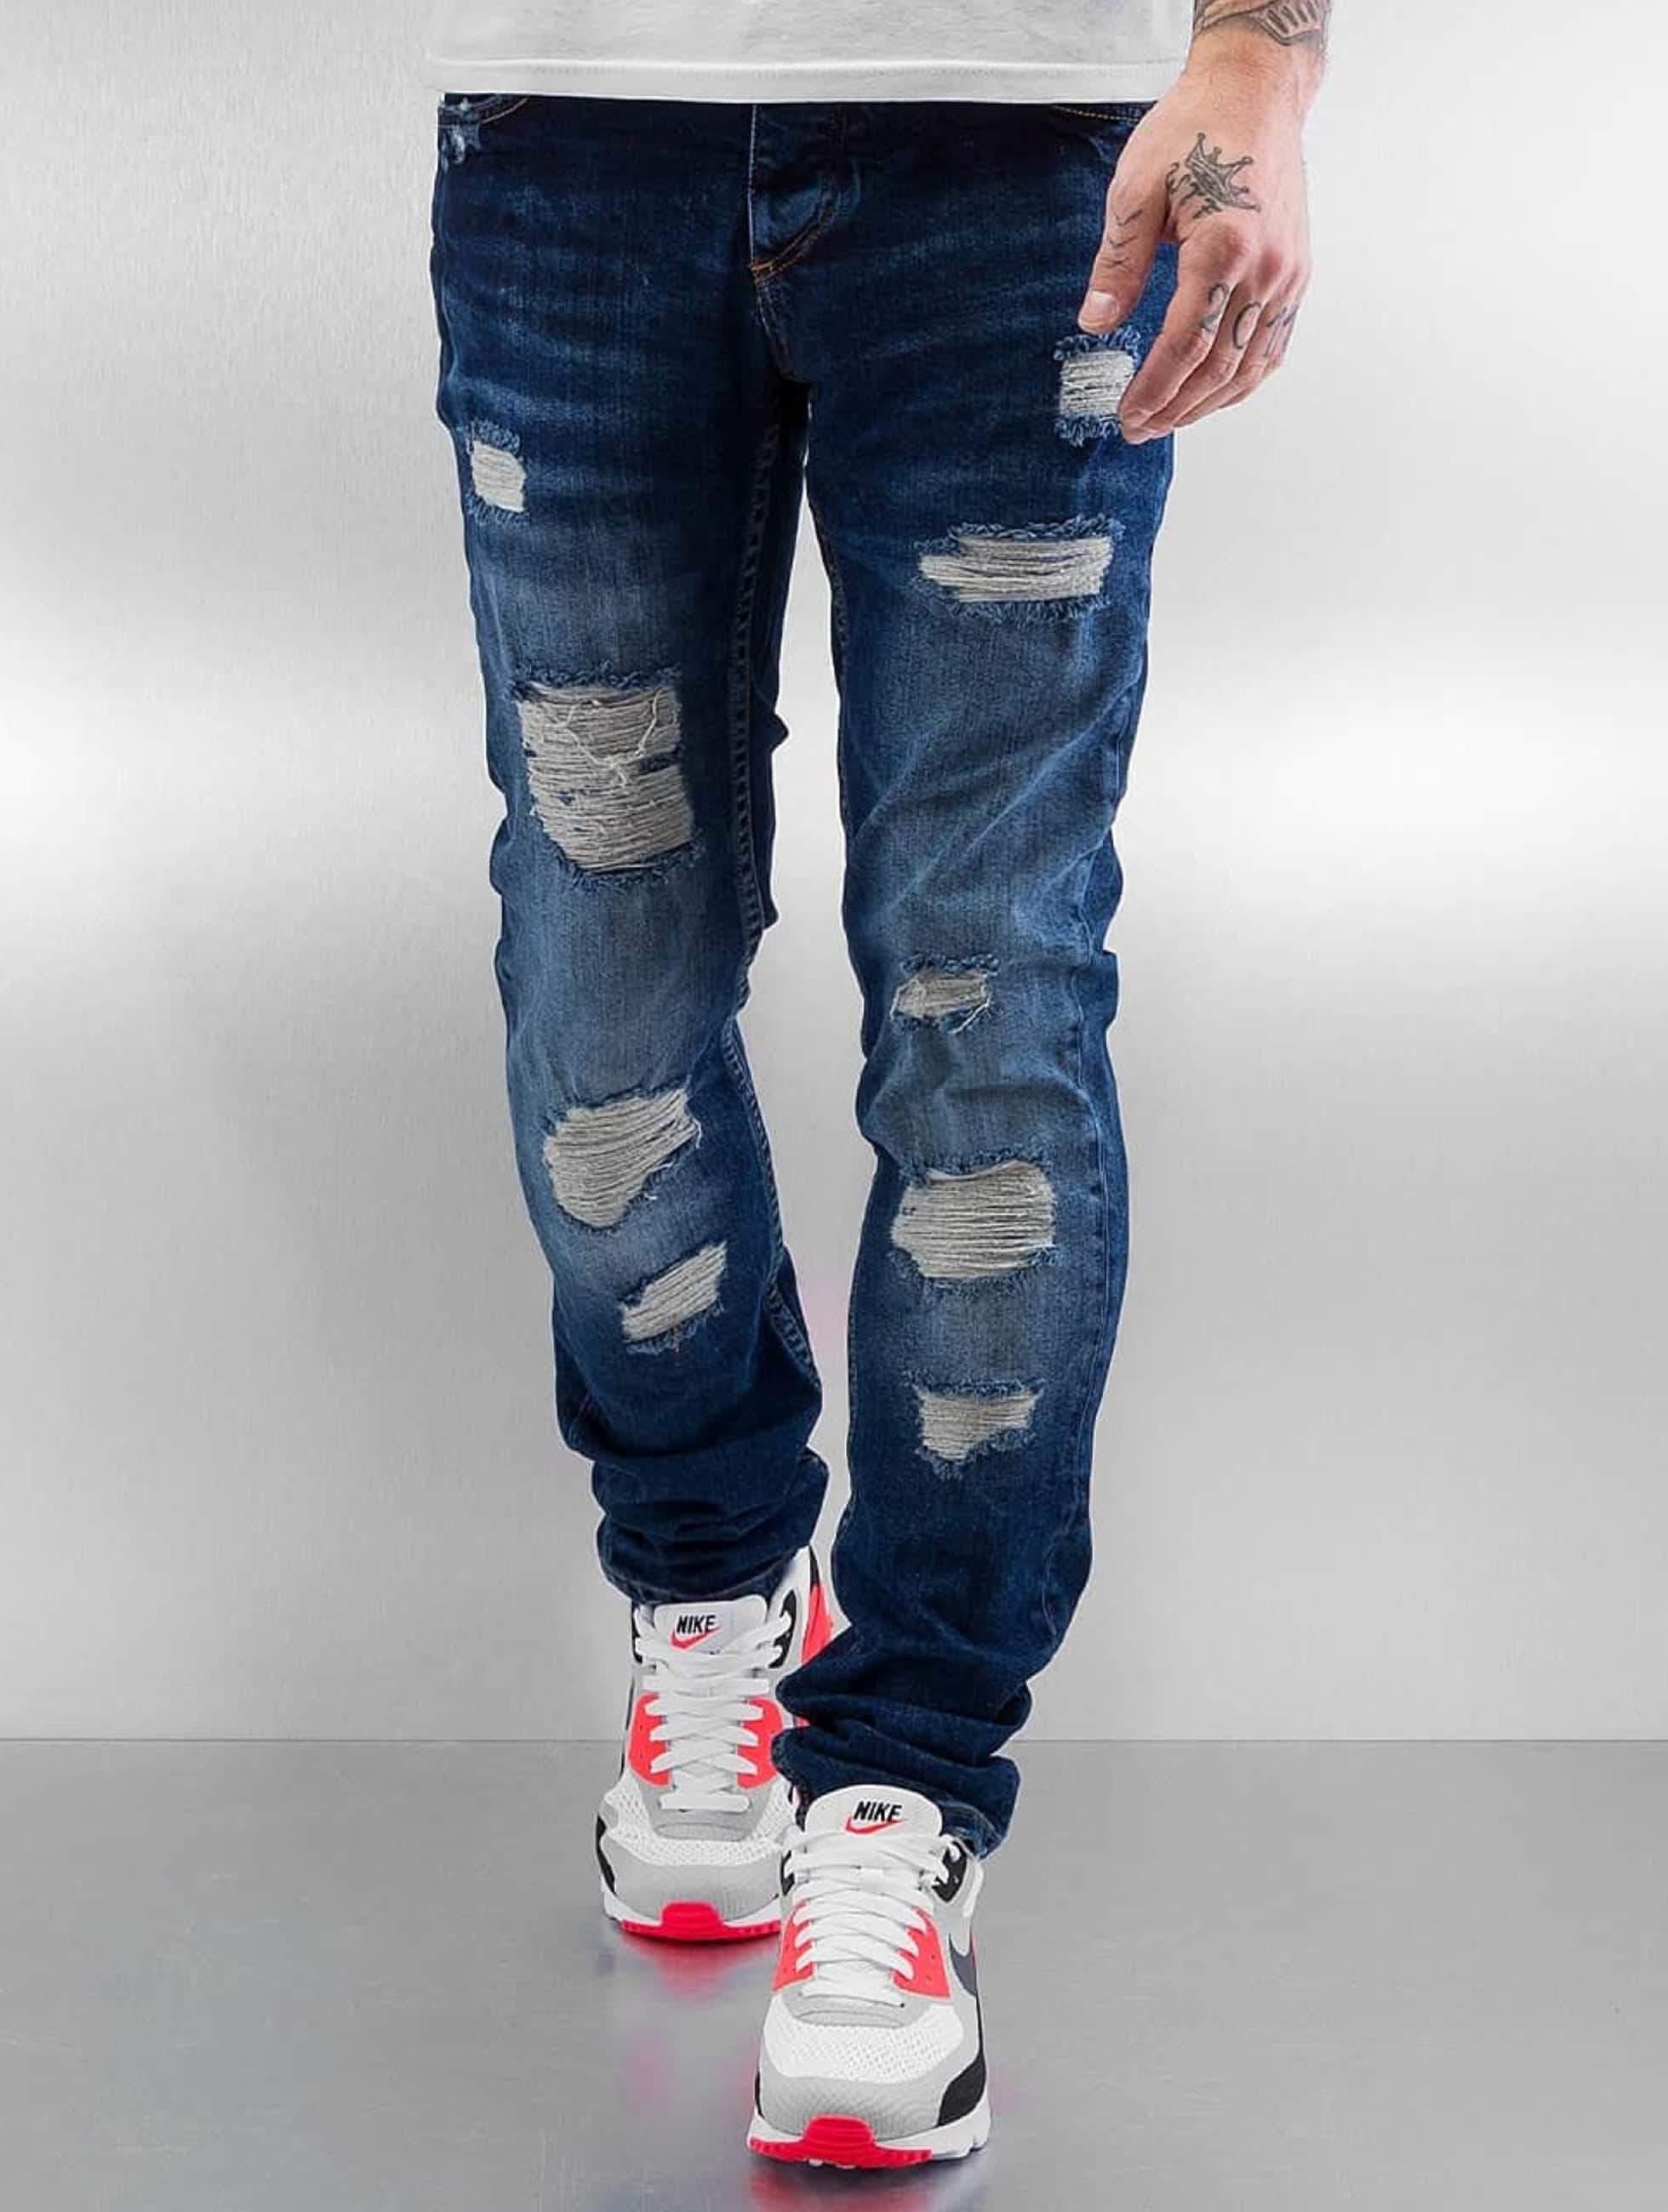 2Y / Skinny Jeans Bishen in blue W 32